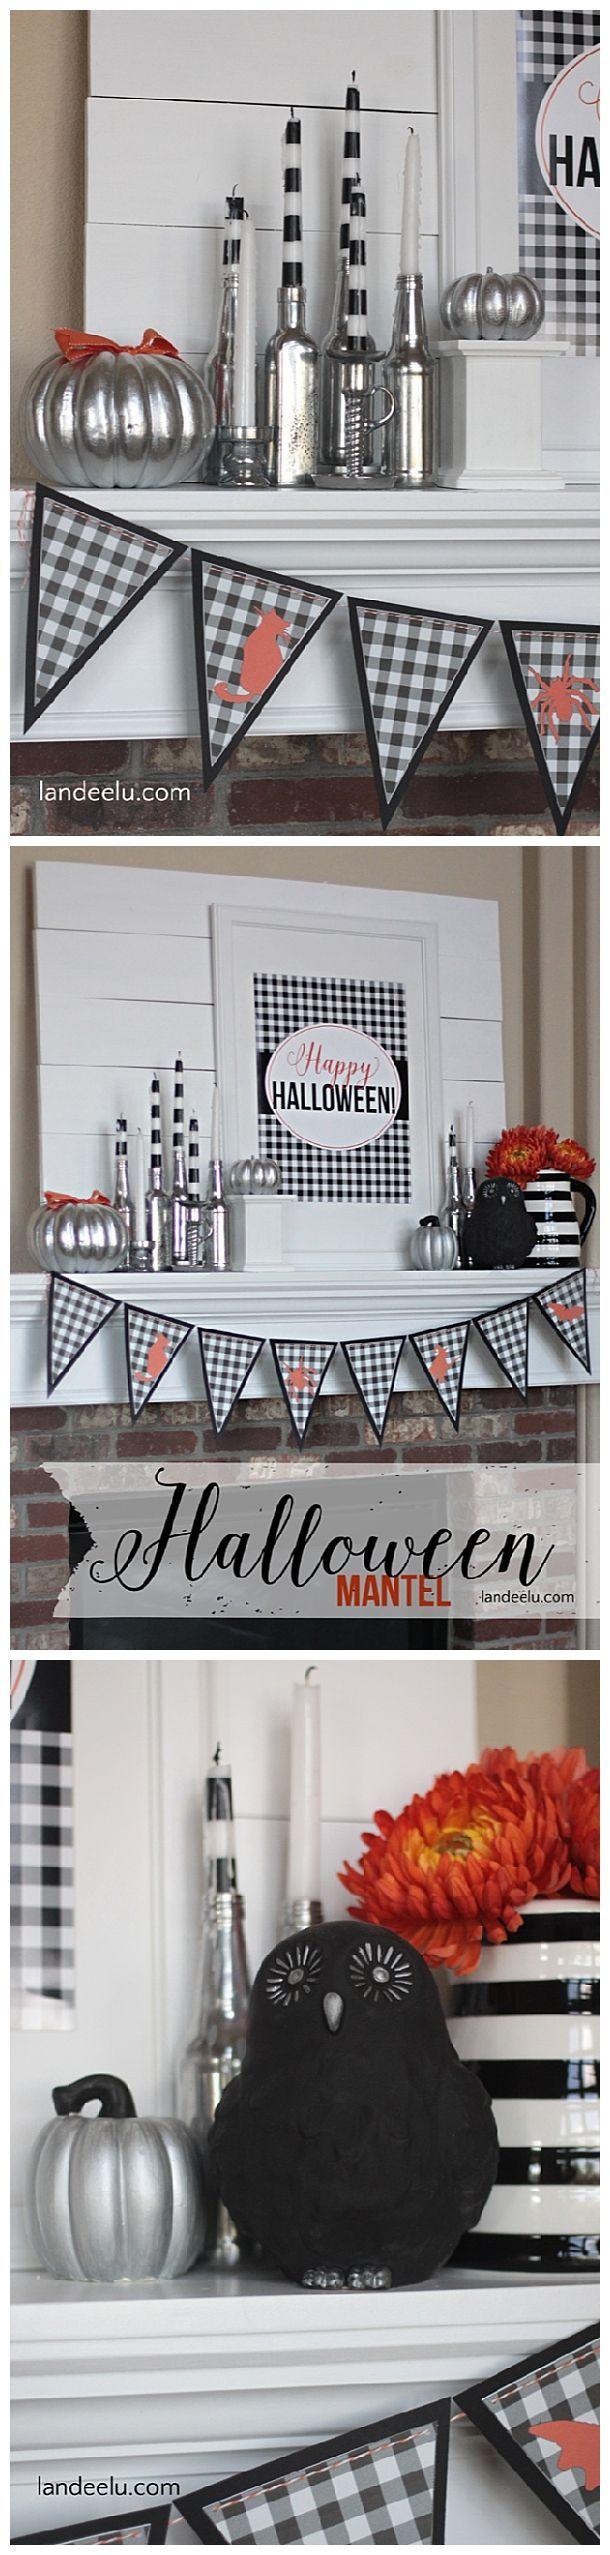 Black and White Halloween Mantel DIY Decoration